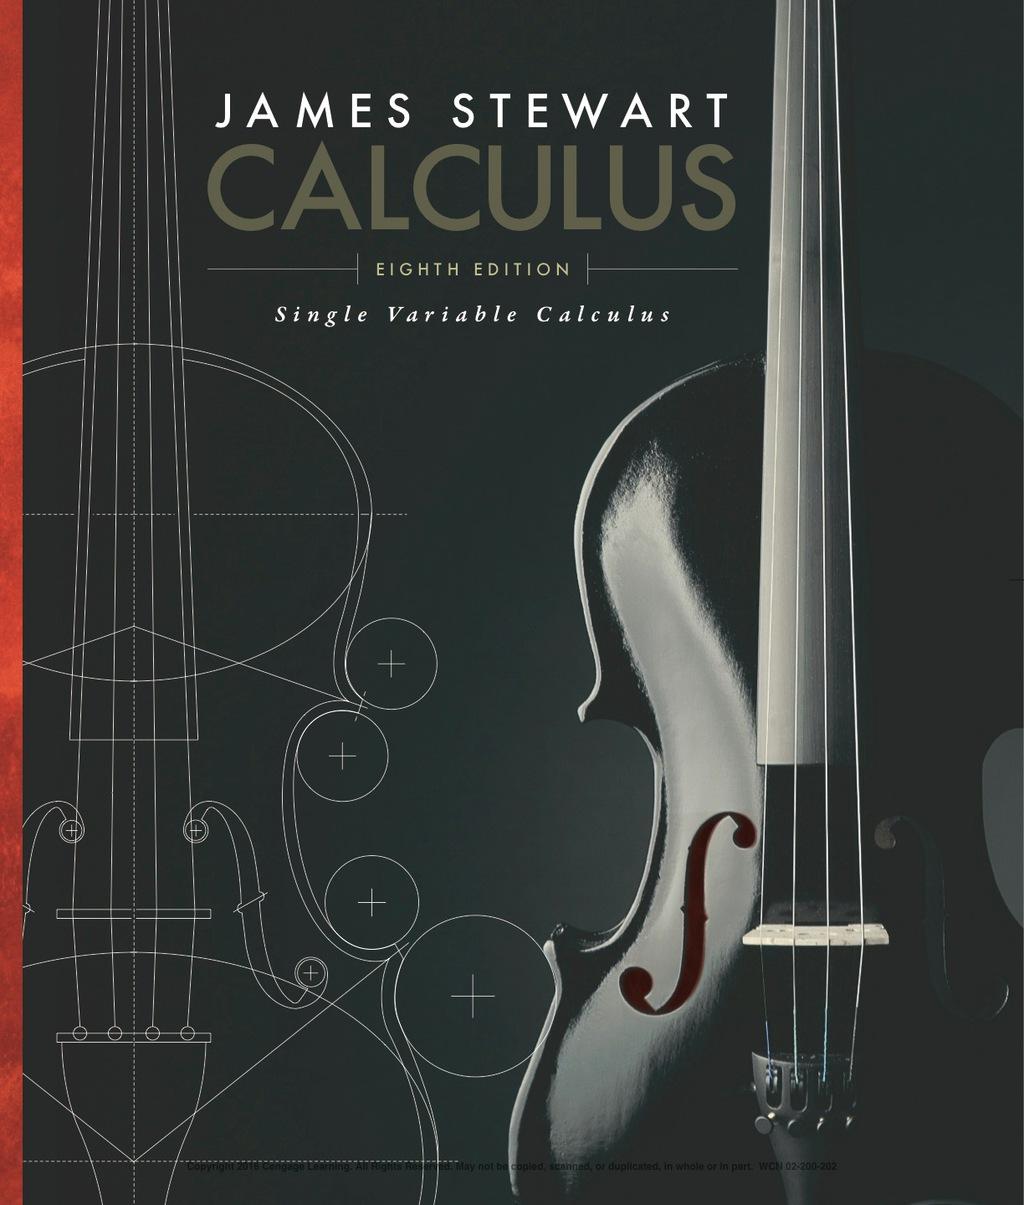 By James Stewart PRINTISBN: 9781305266636 E-TEXT ISBN: 9781305548725 Edition: 8